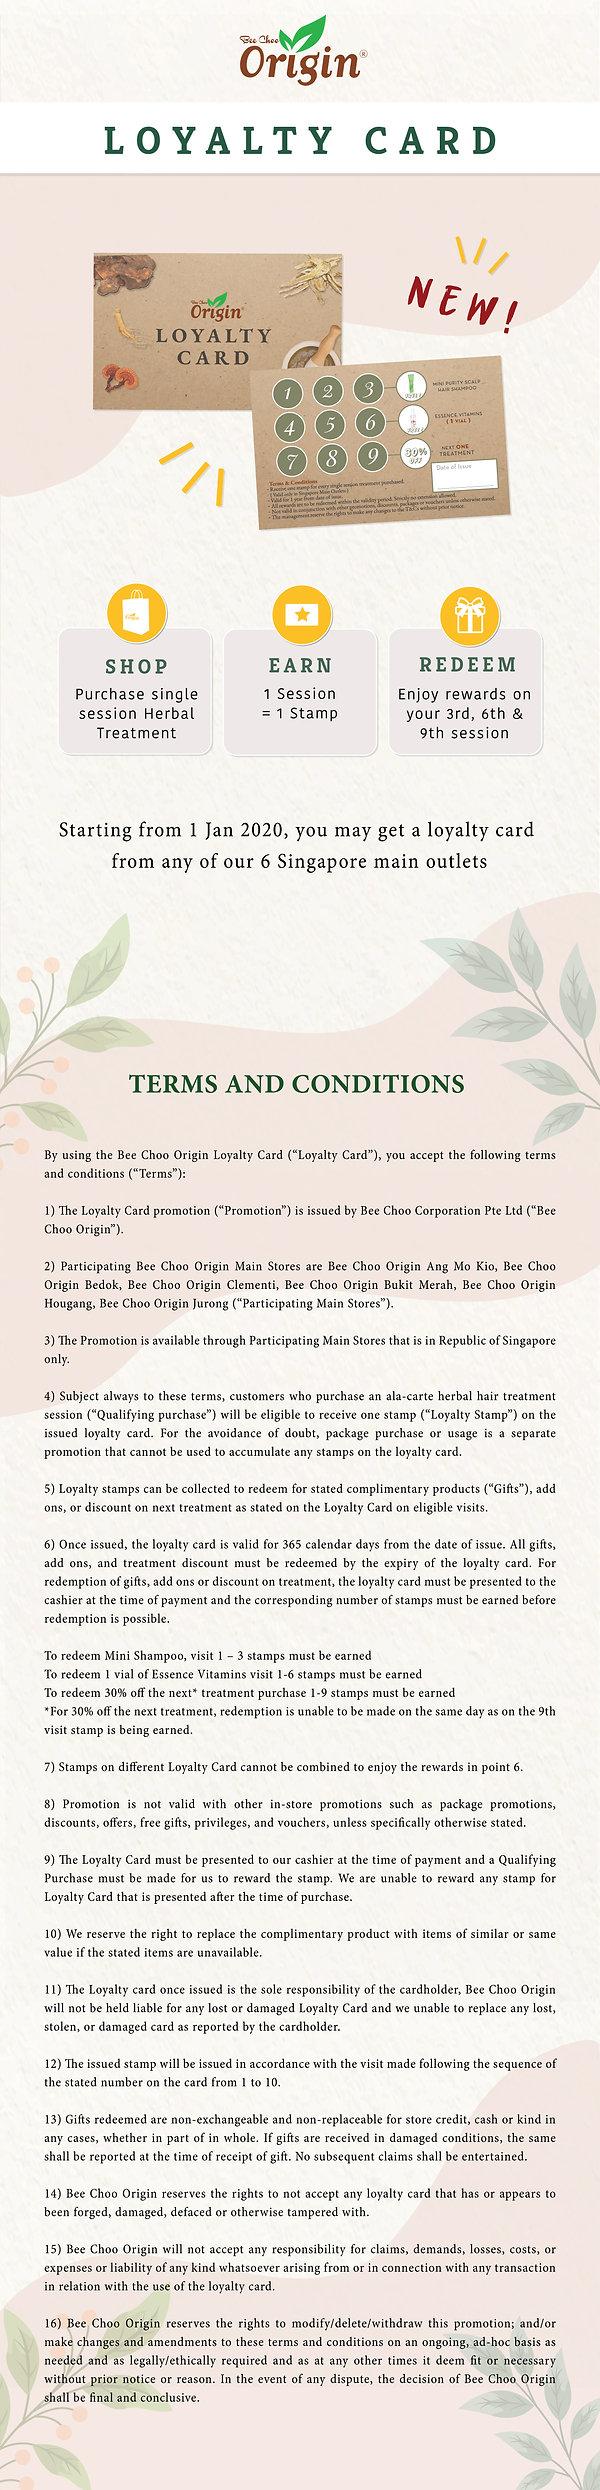 Loyalty Card T&Cs-(19-03-2021).jpg